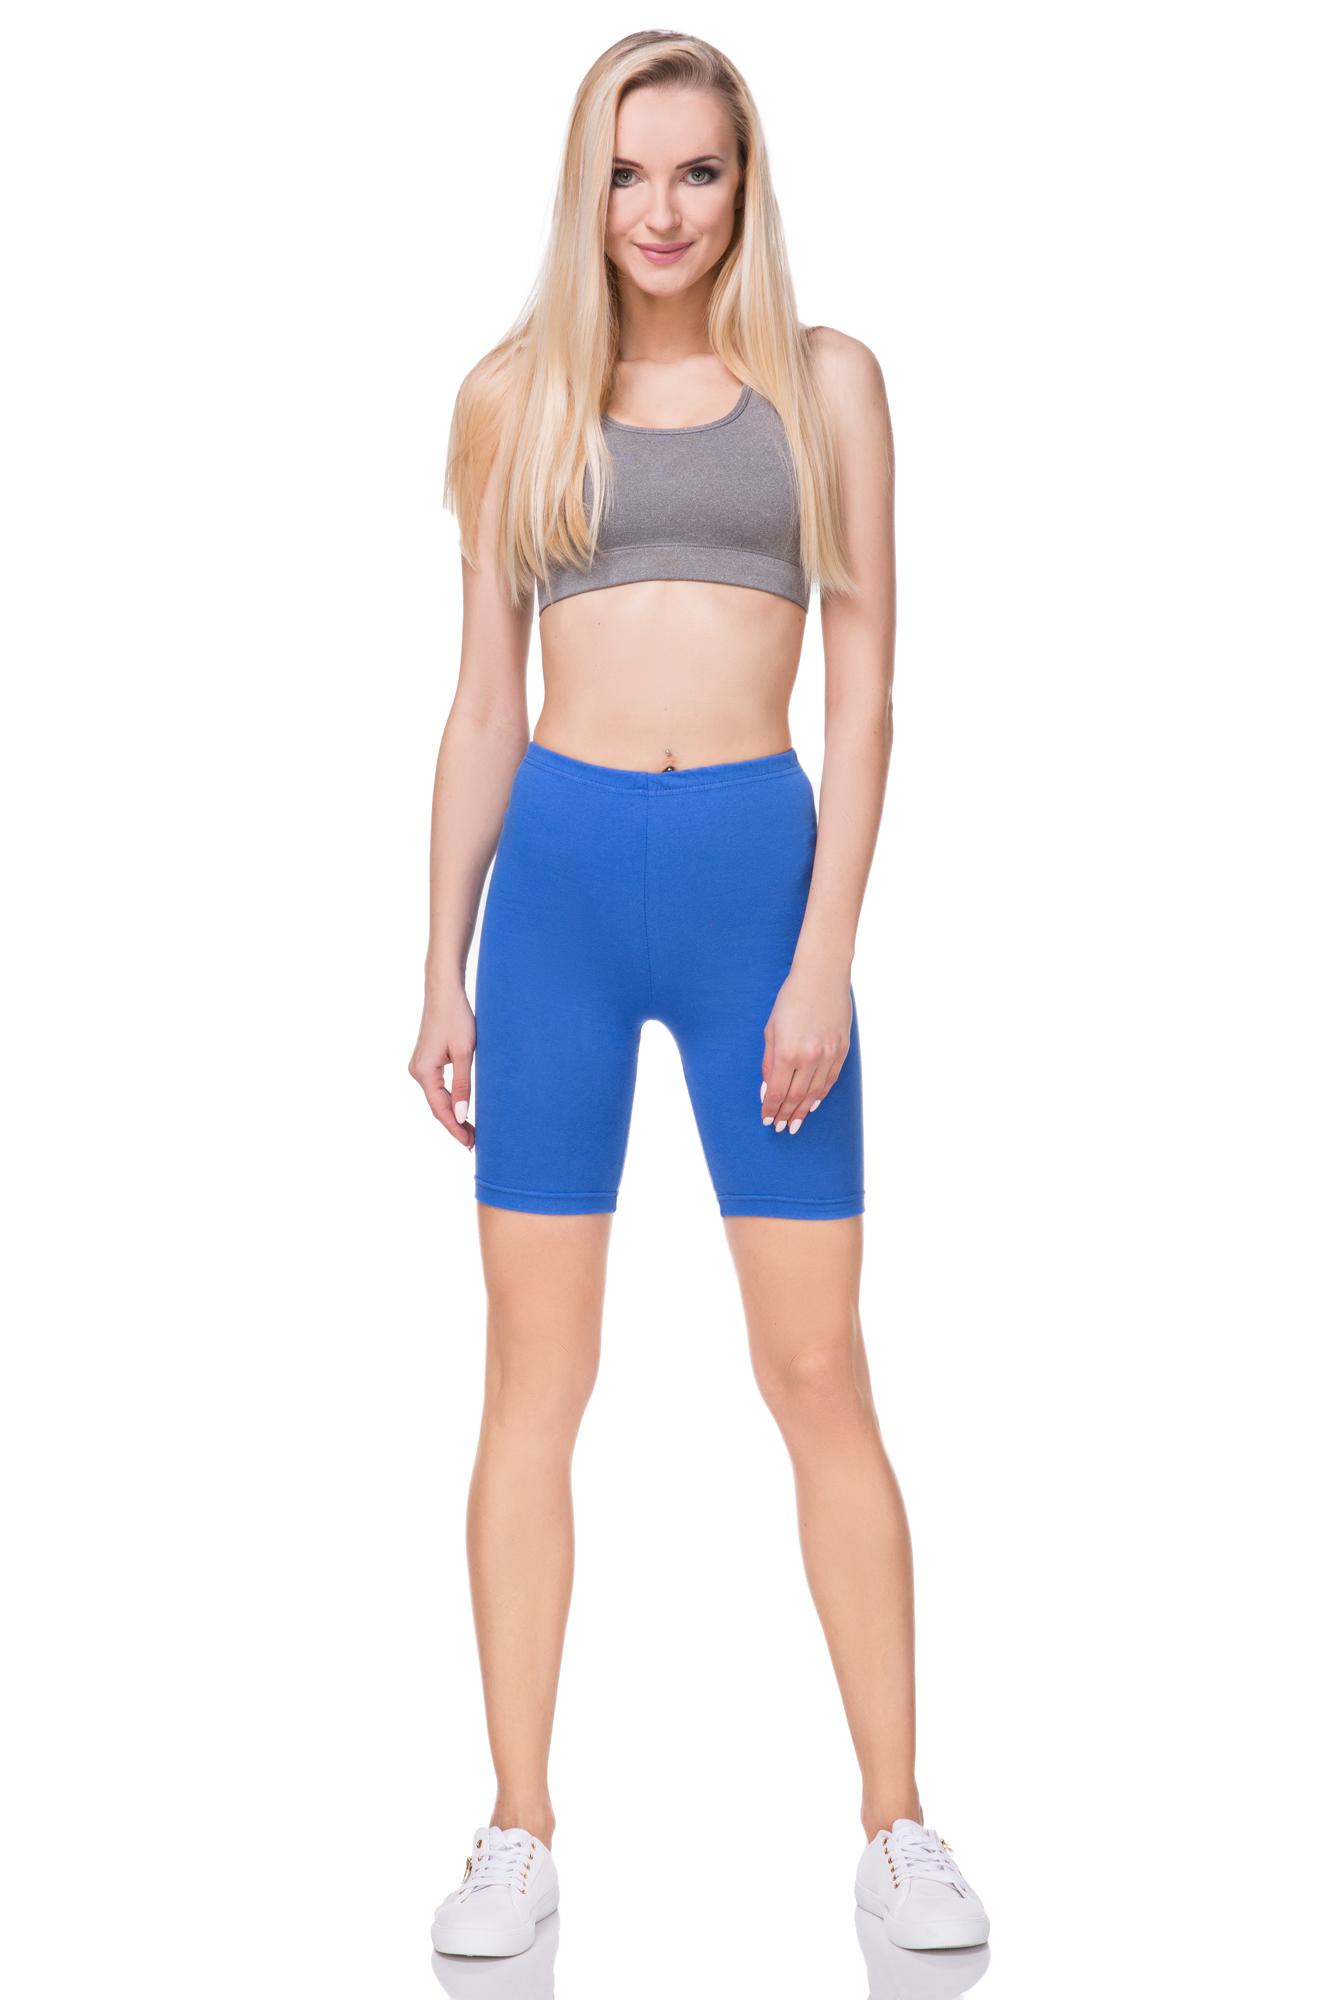 Knee Shorts Active Sport Dance Cycling PLKX Cotton Leggings 1//2 Length Above